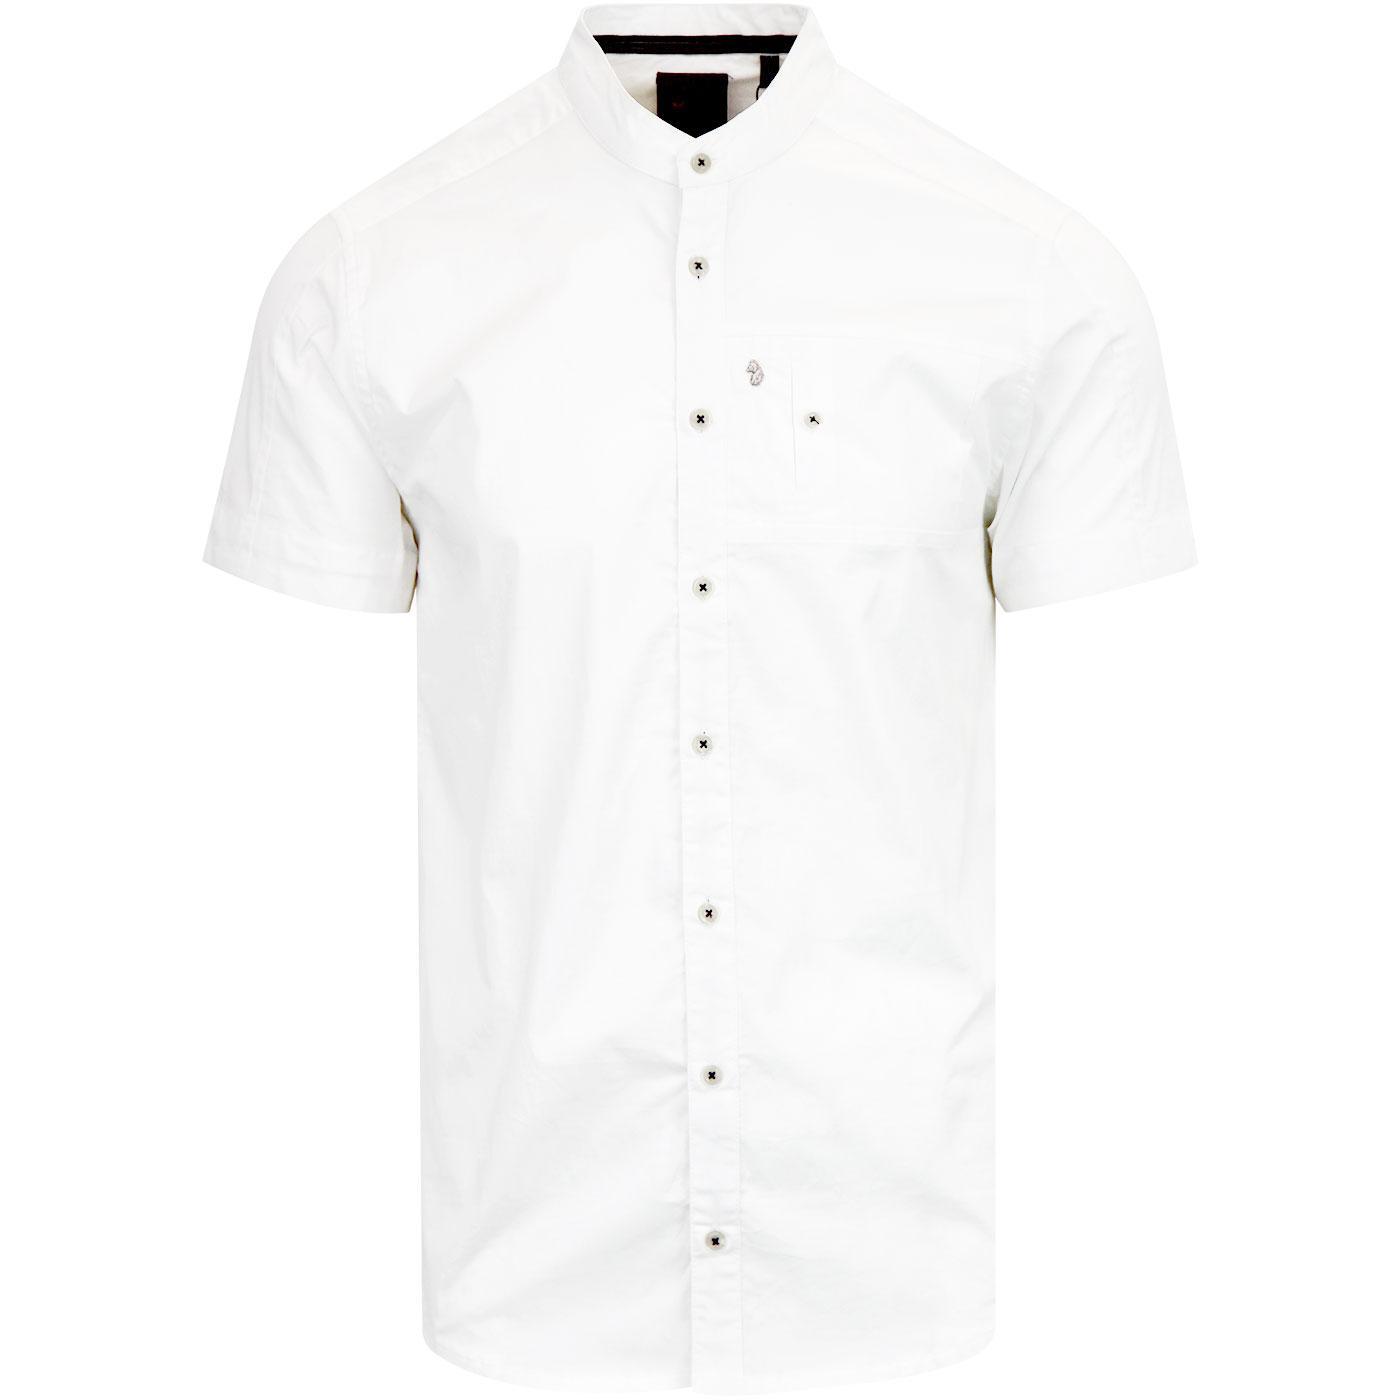 Wockneys LUKE 1977 Short Sleeve Grandad Shirt W